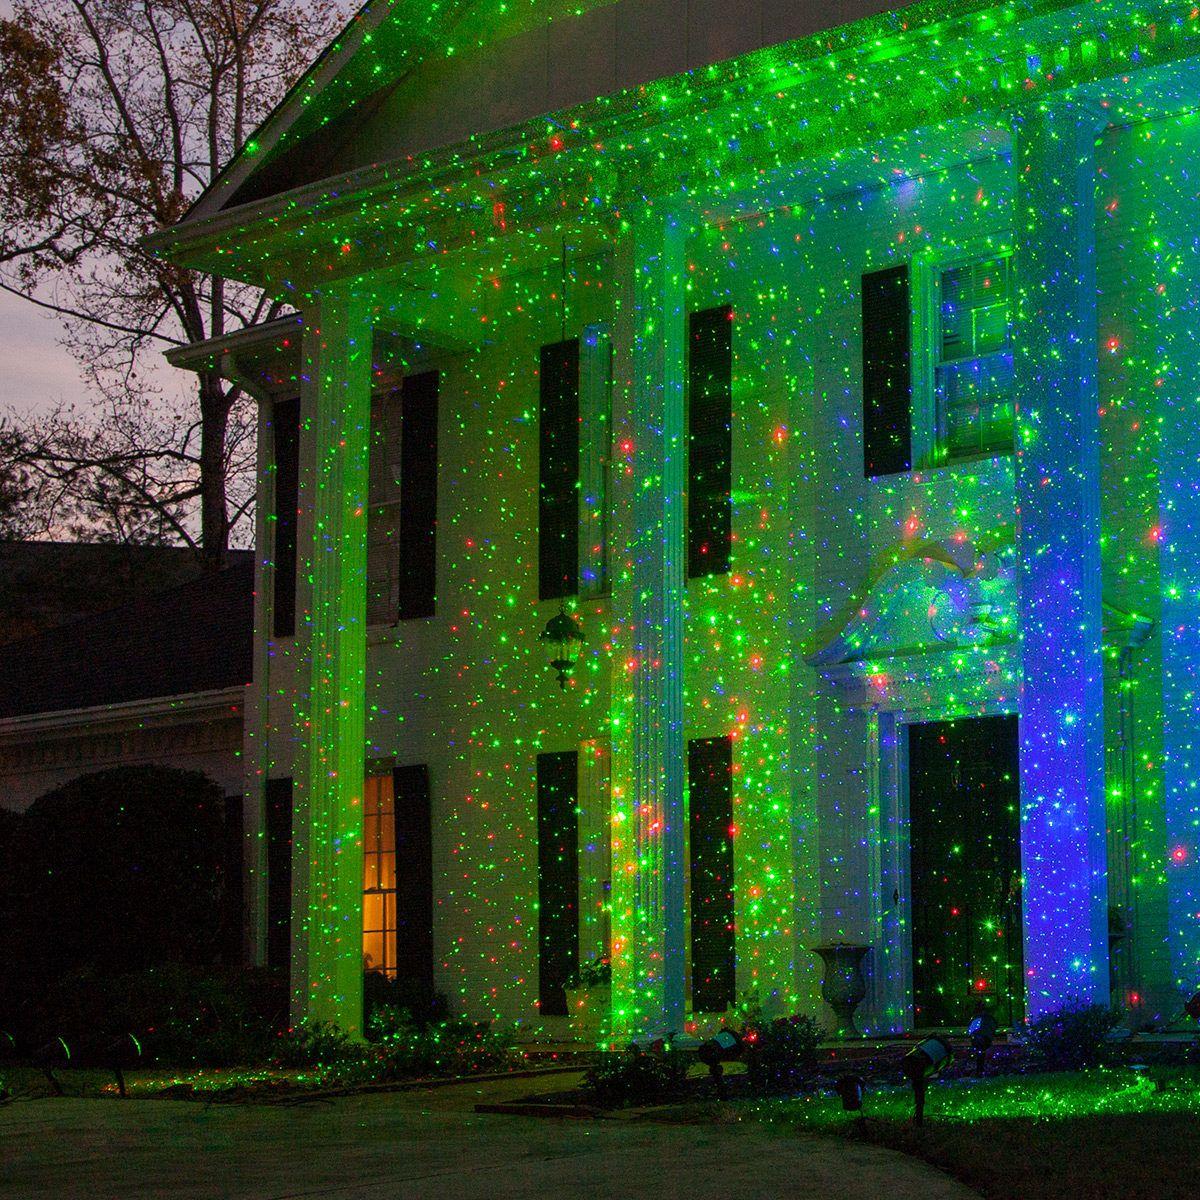 Outdoor Christmas Decorating Ideas Yard Envy Laser Christmas Lights Christmas Light Projector Laser Christmas Lights Projectors